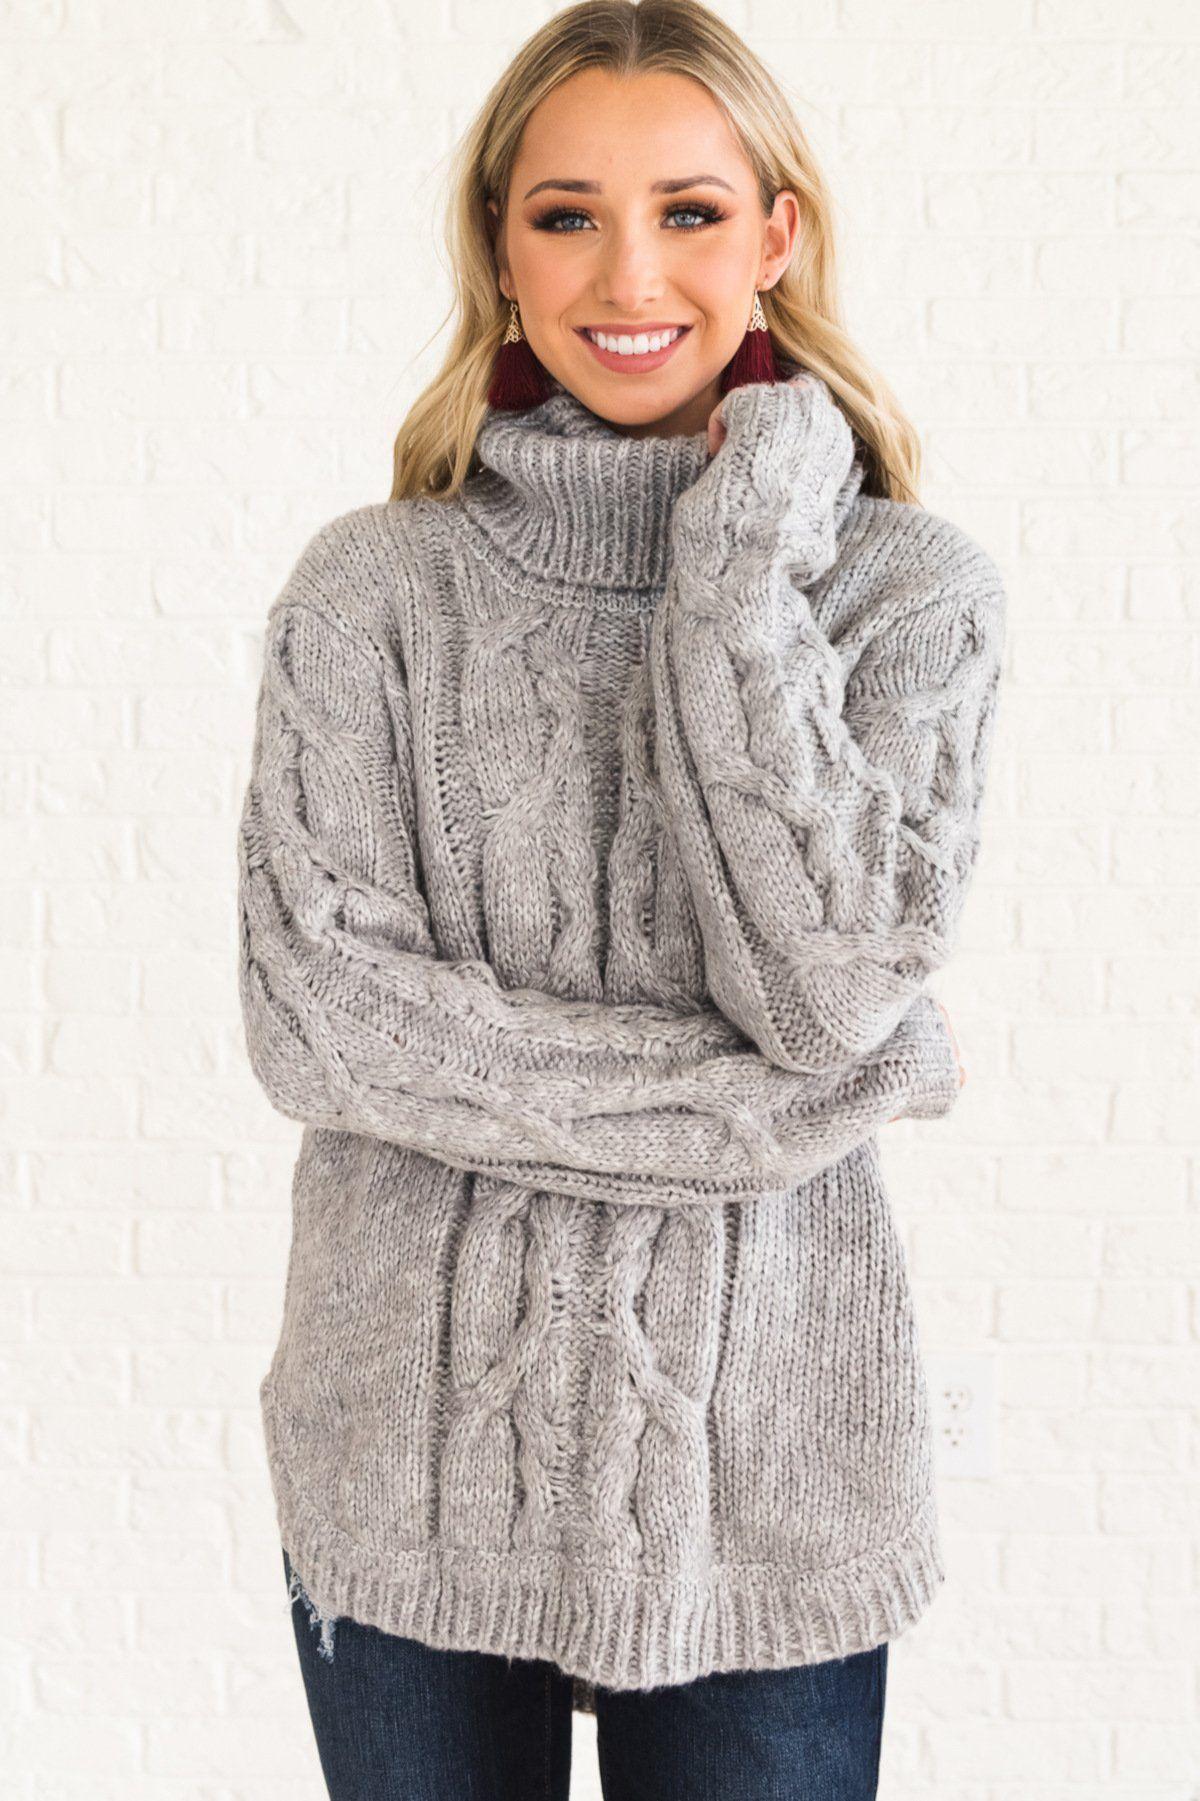 d219497b9da Gray Warm Cozy Cute Long Turtleneck Cable Knit Sweaters for Women